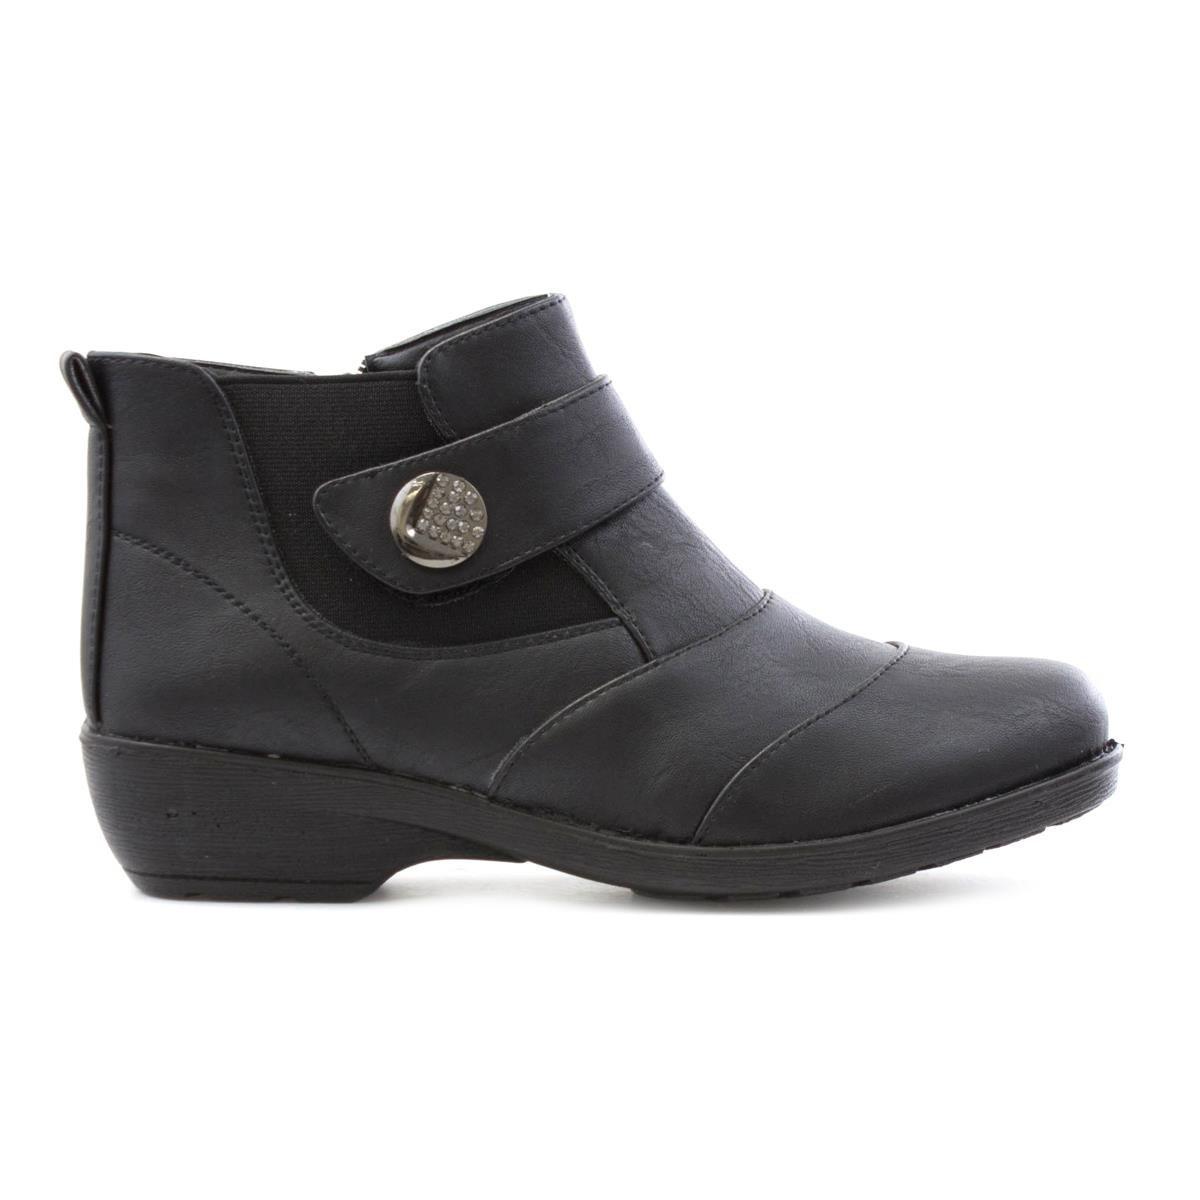 b8ec7b9f9 Softlites Womens Ankle Boot in Black - Size 9 UK - Black  Amazon.co.uk   Shoes   Bags